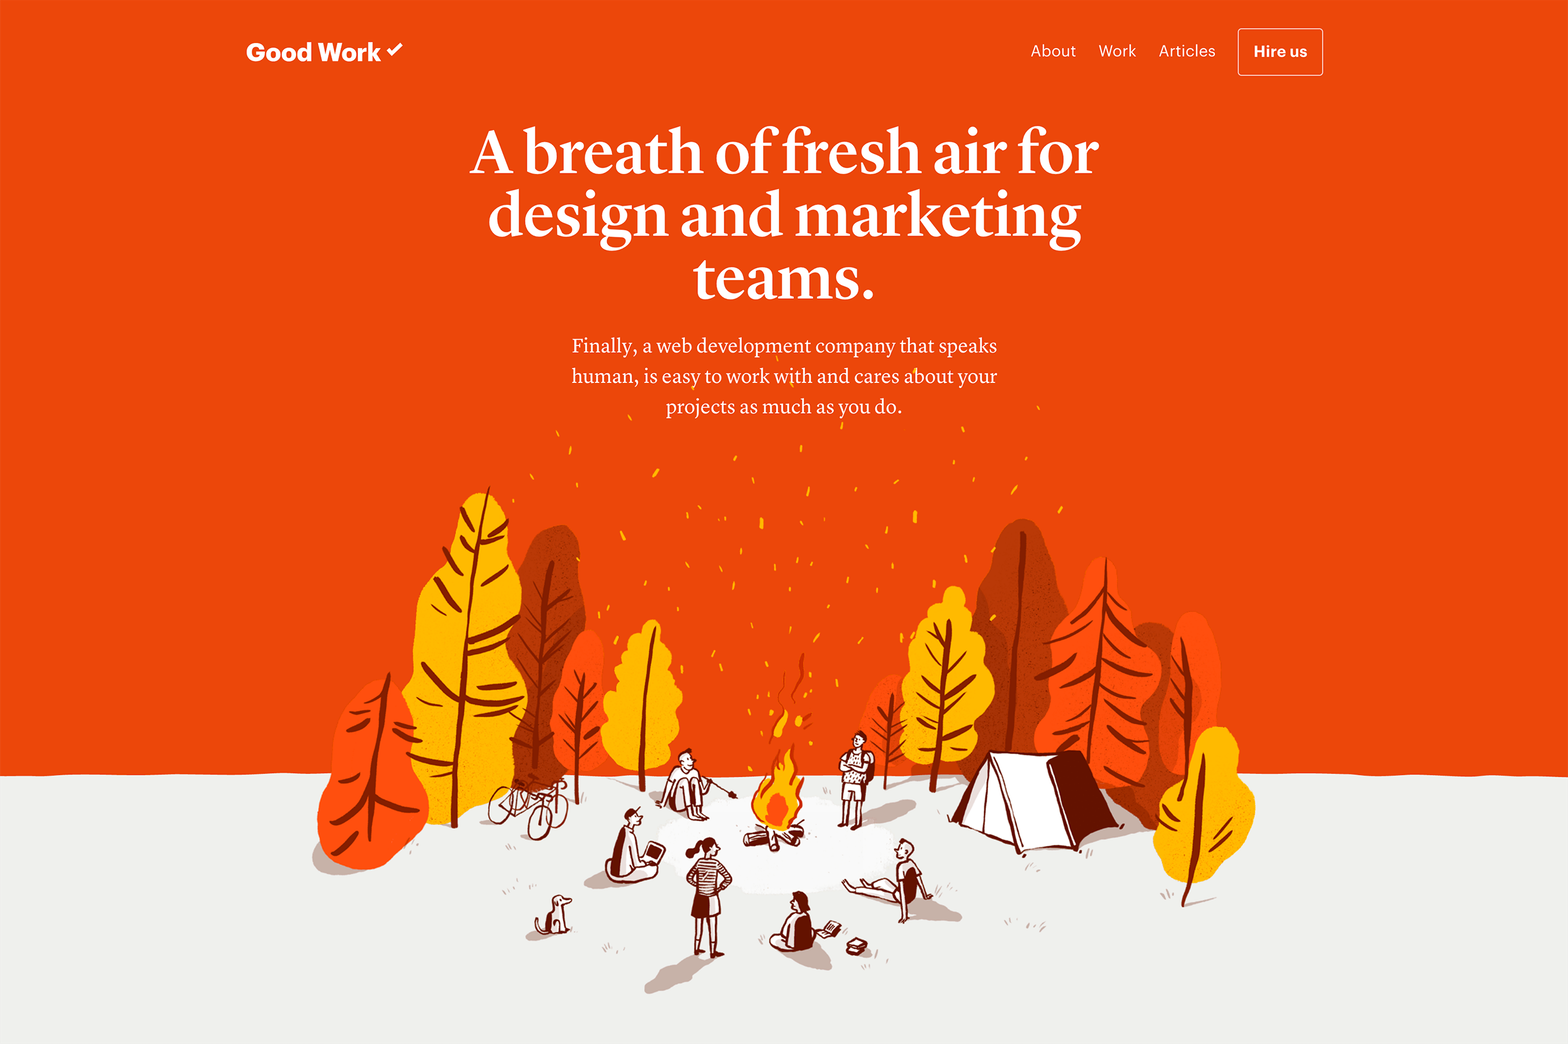 Good Work website